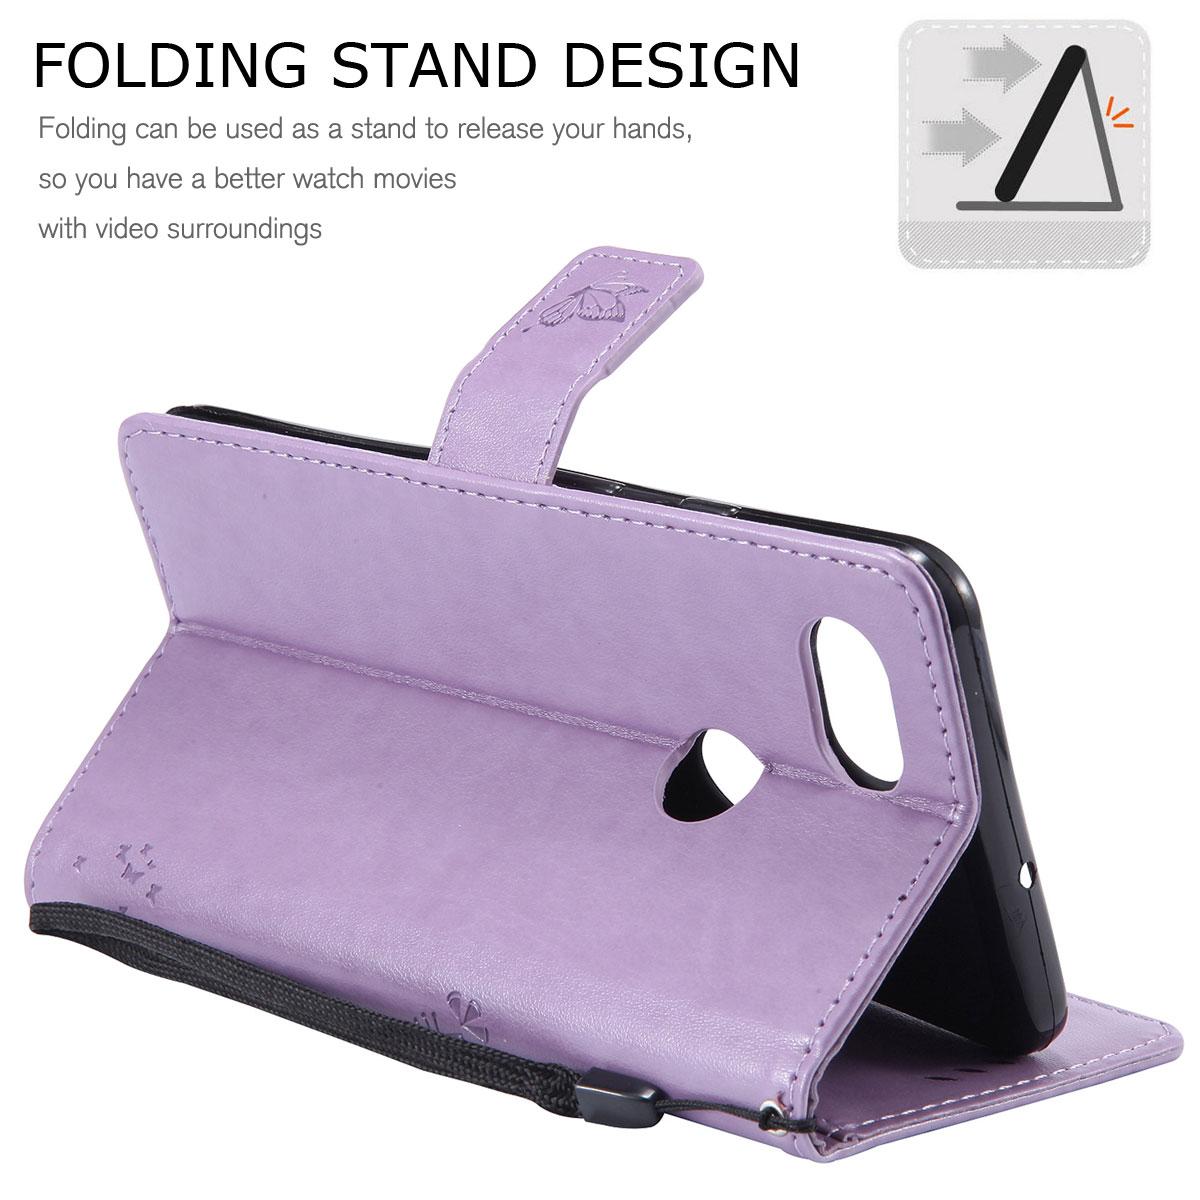 Magnetic-Leather-Credit-Card-Holder-Flip-Case-Cover-For-Google-Pixel-2-2-XL thumbnail 99